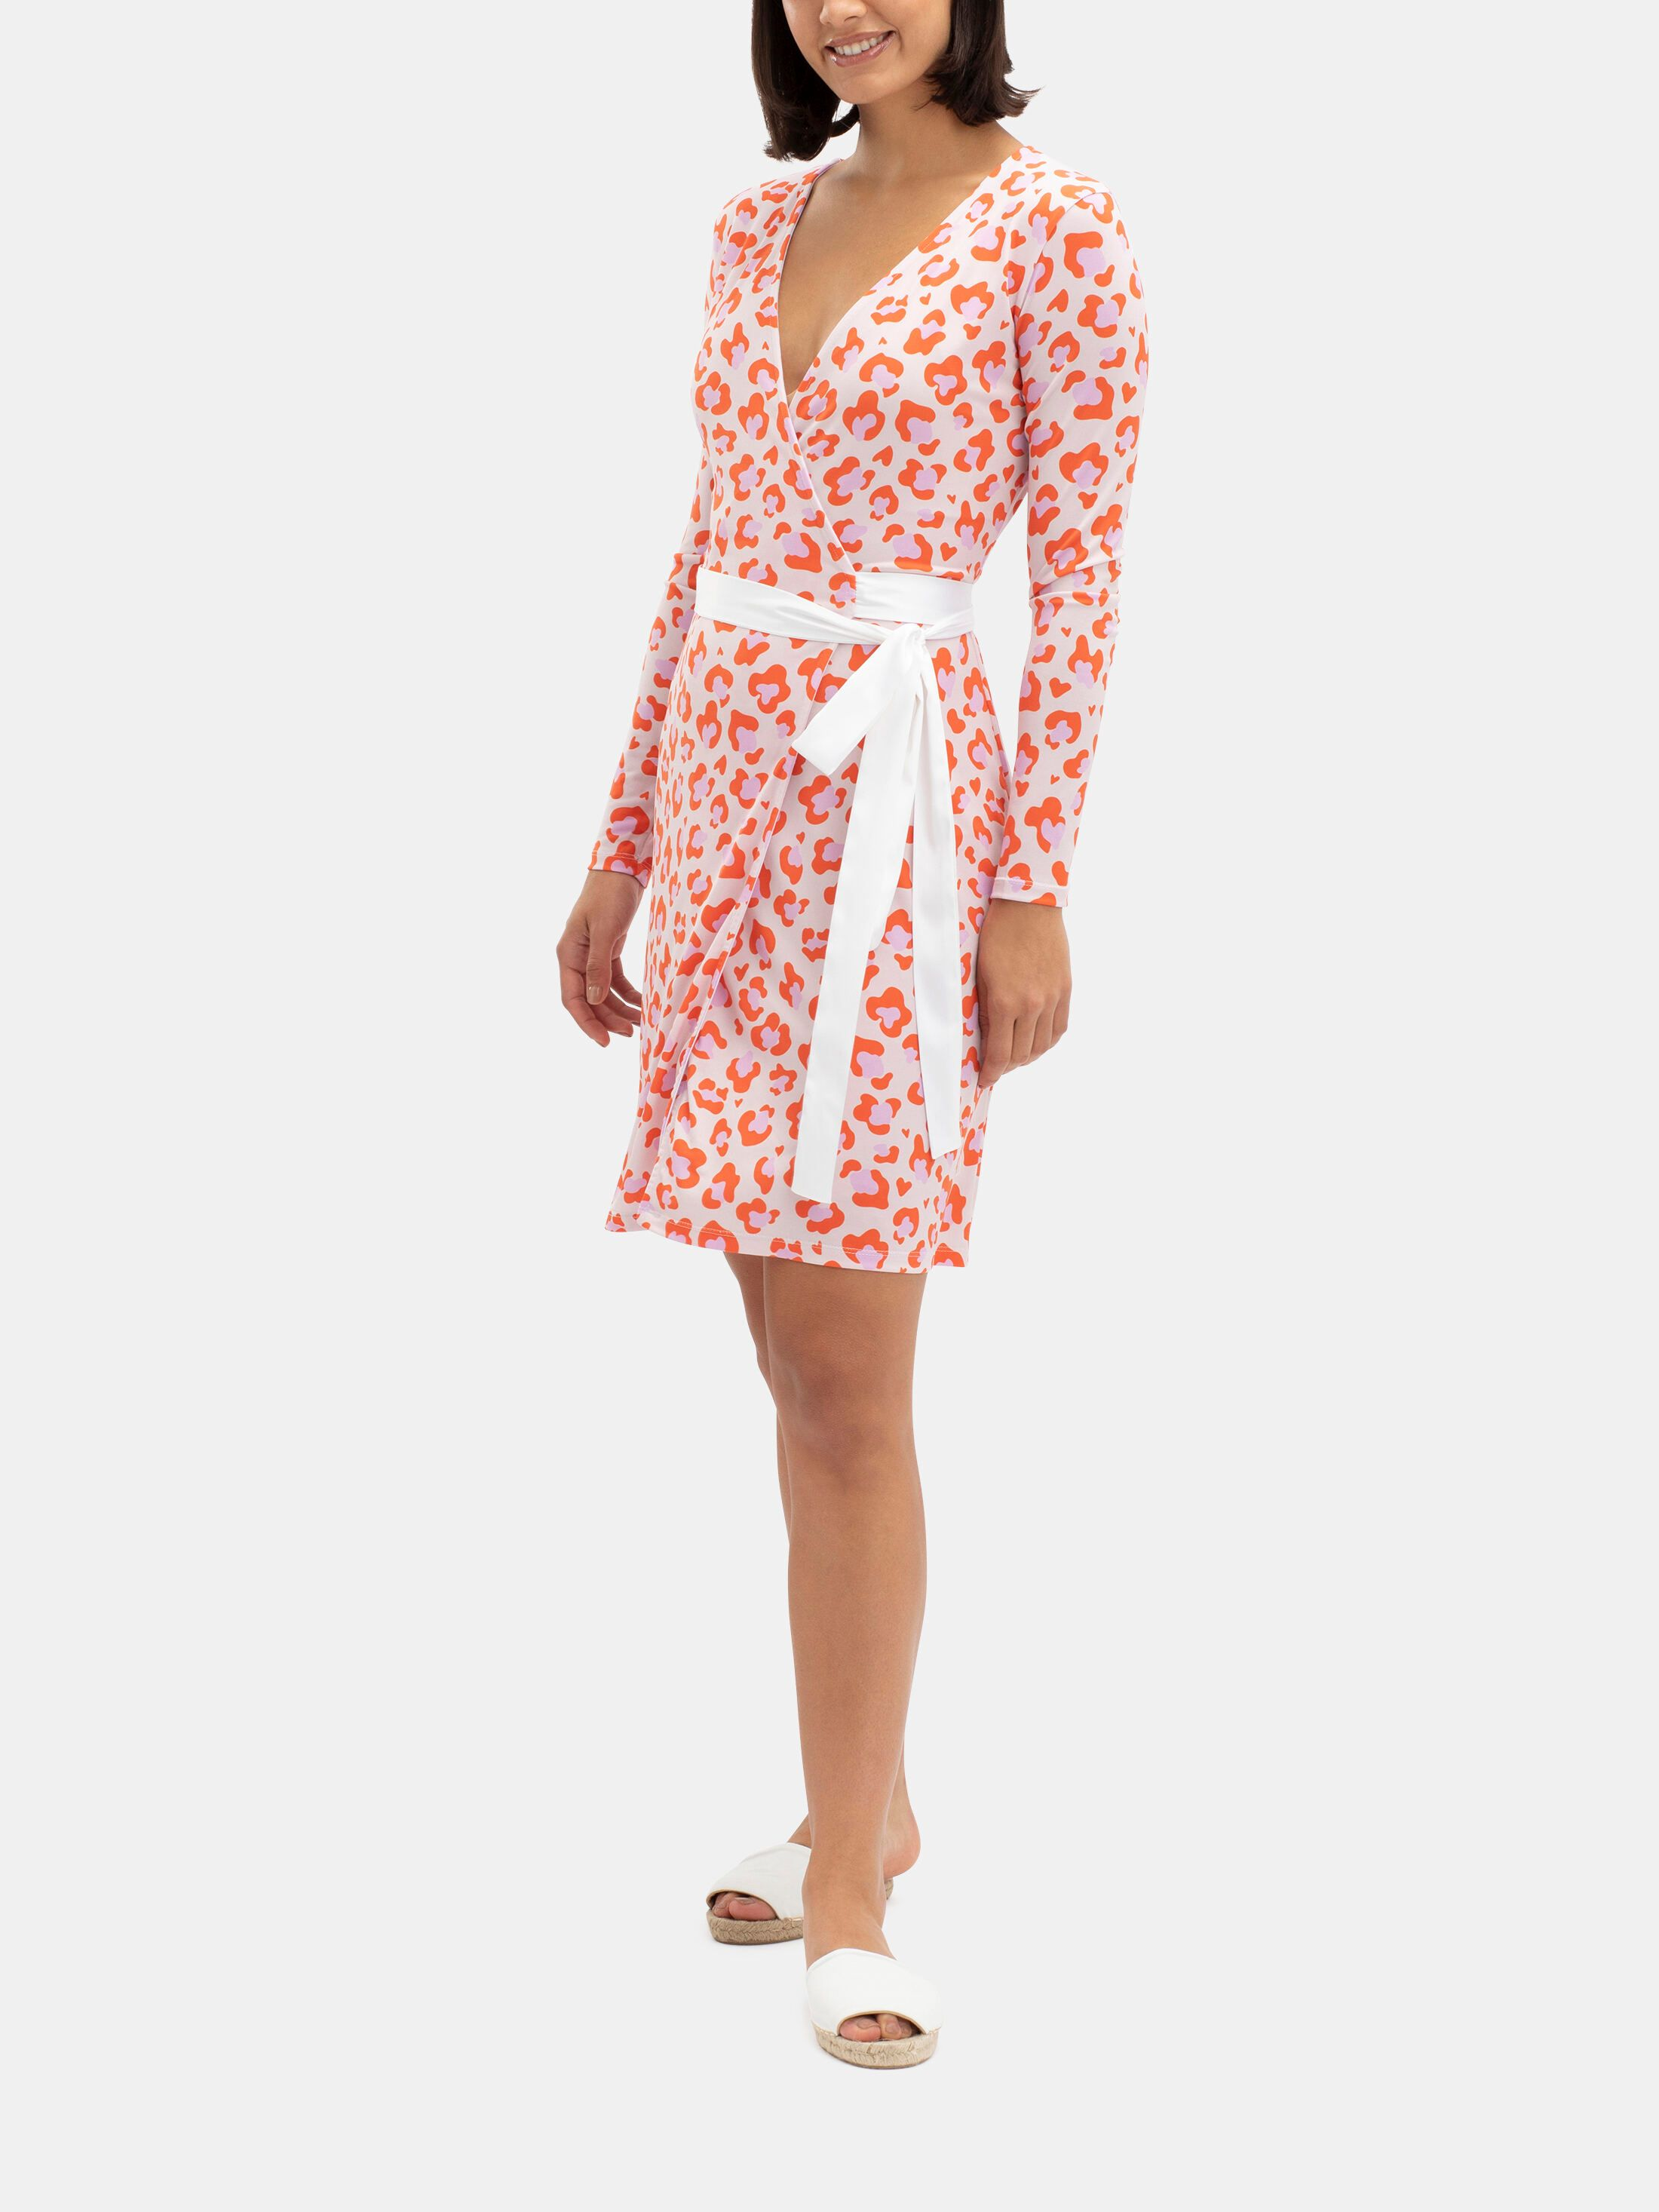 printed your own custom wrap dress